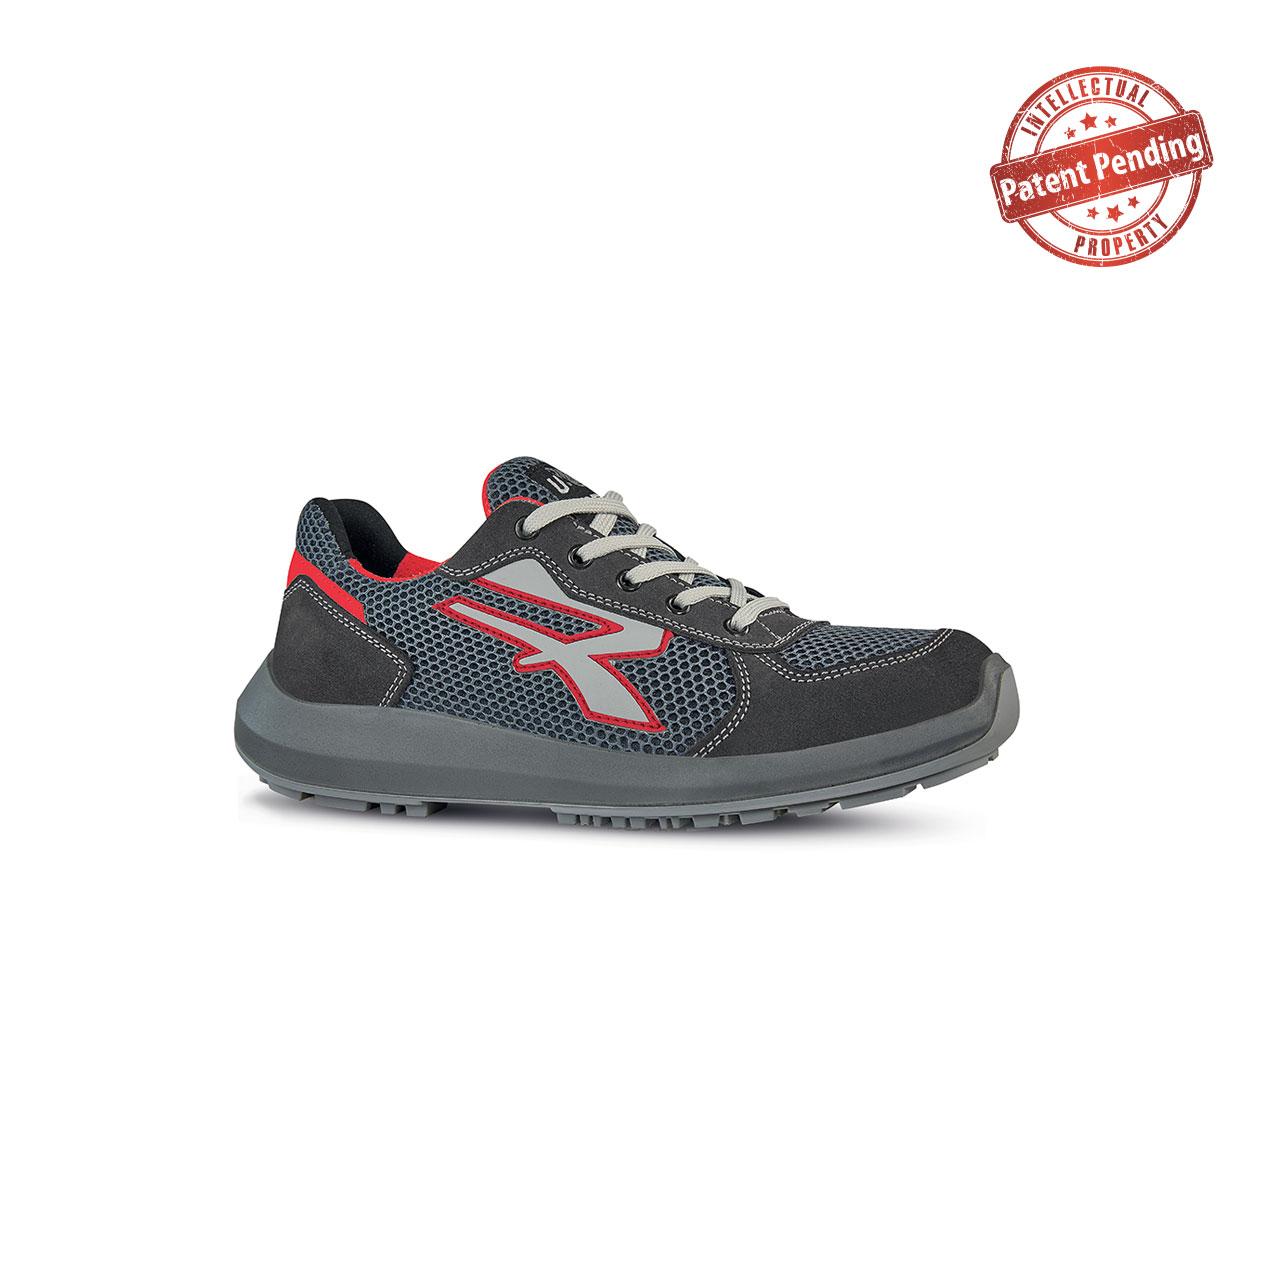 scarpa antinfortunistica upower modello skat linea redup vista laterale